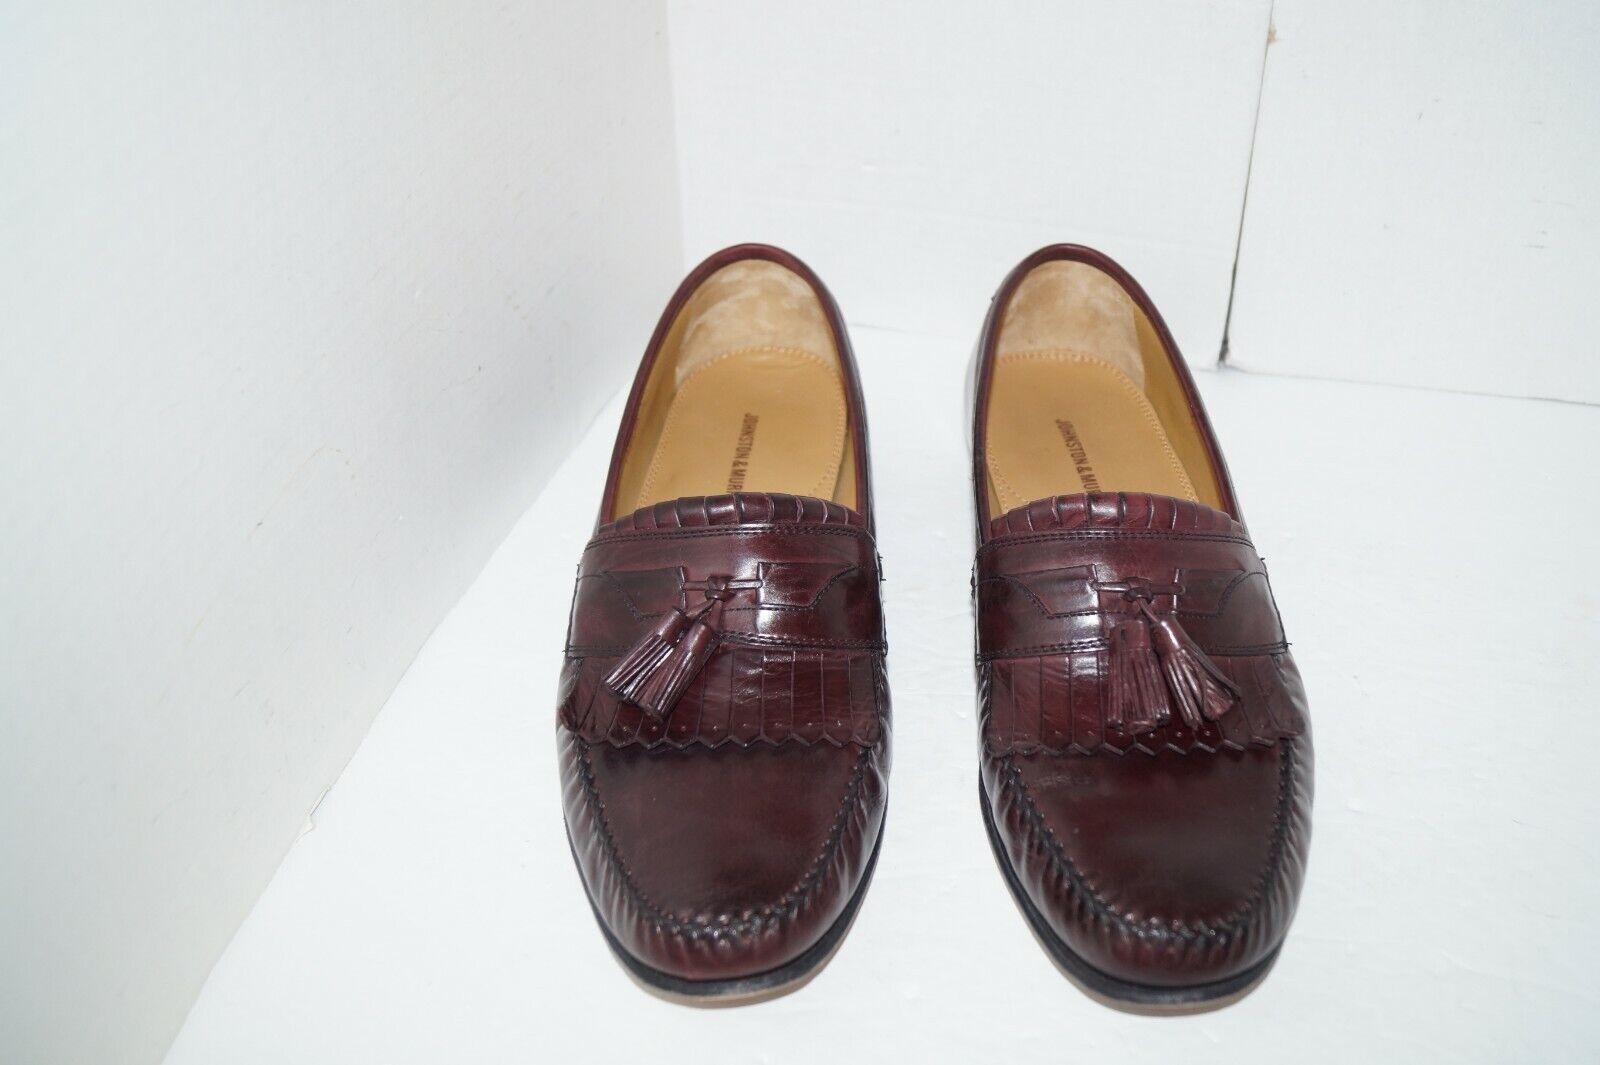 JOHNSON & MURPHY 15-0834 Breland CORDOVAN Kiltie Tassel Dress Loafers Shoes 12